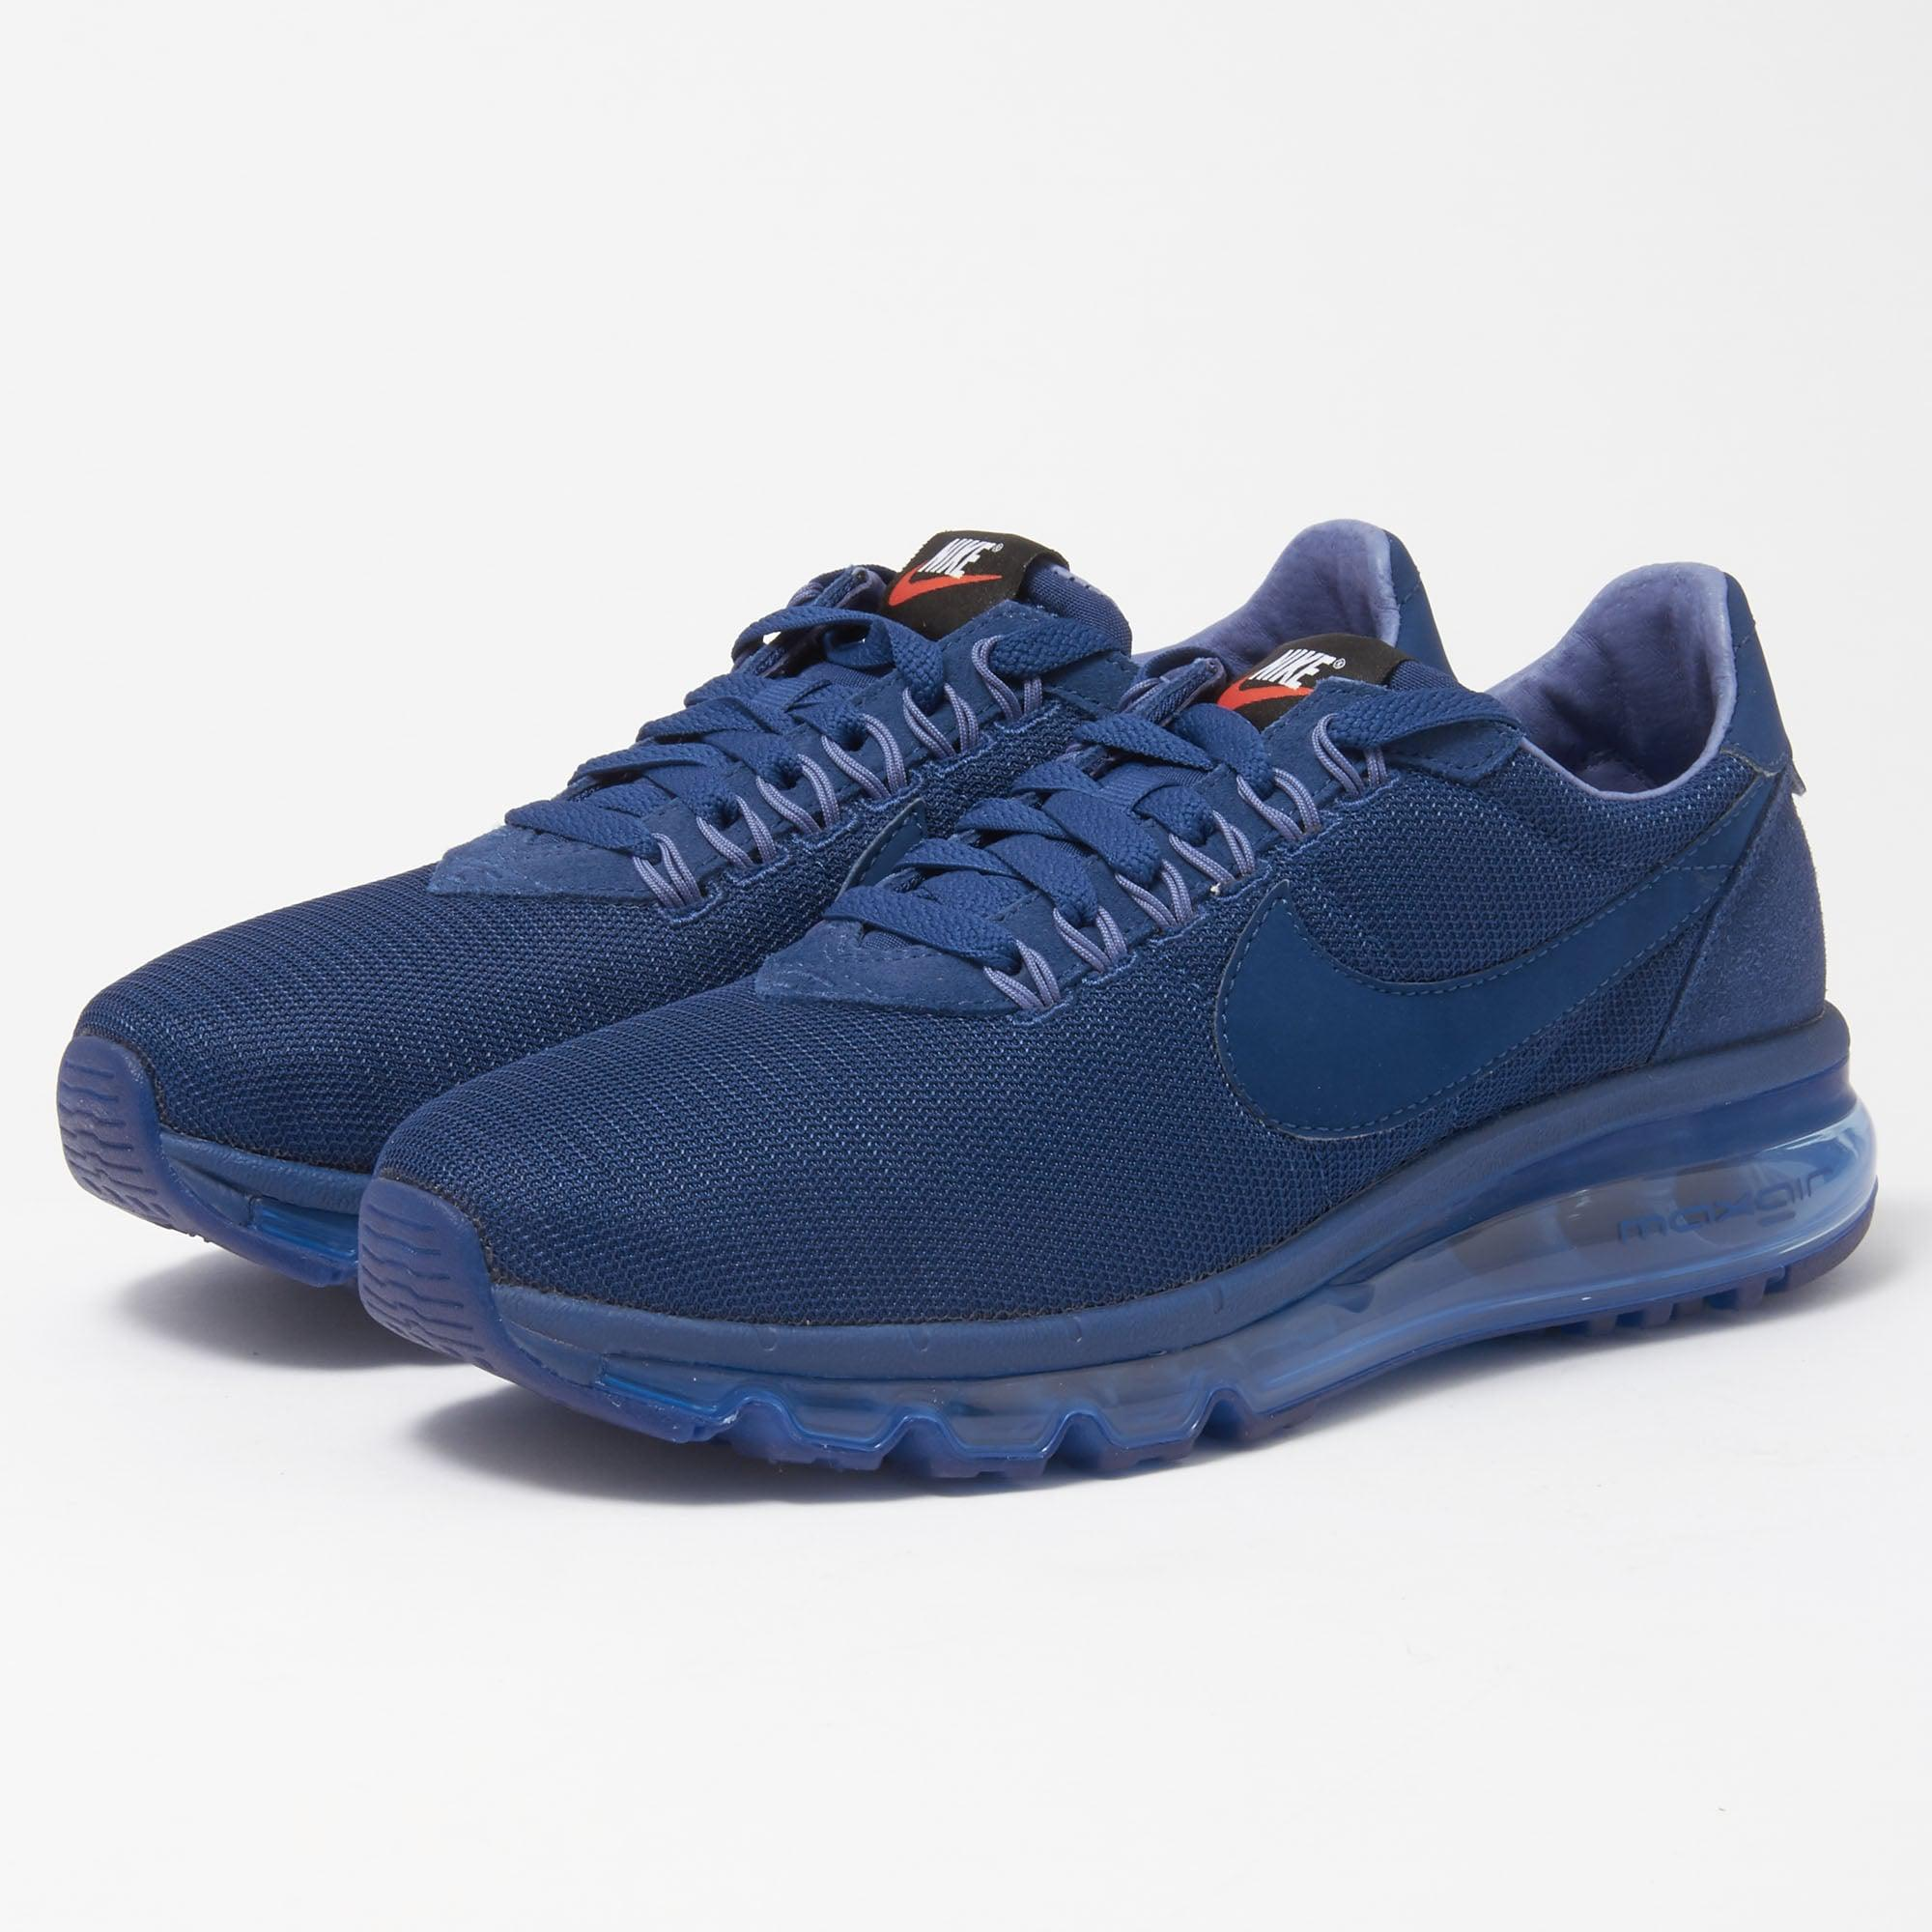 Lyst - Nike Air Max Ld-Zero in Blue for Men 58b39c5f6